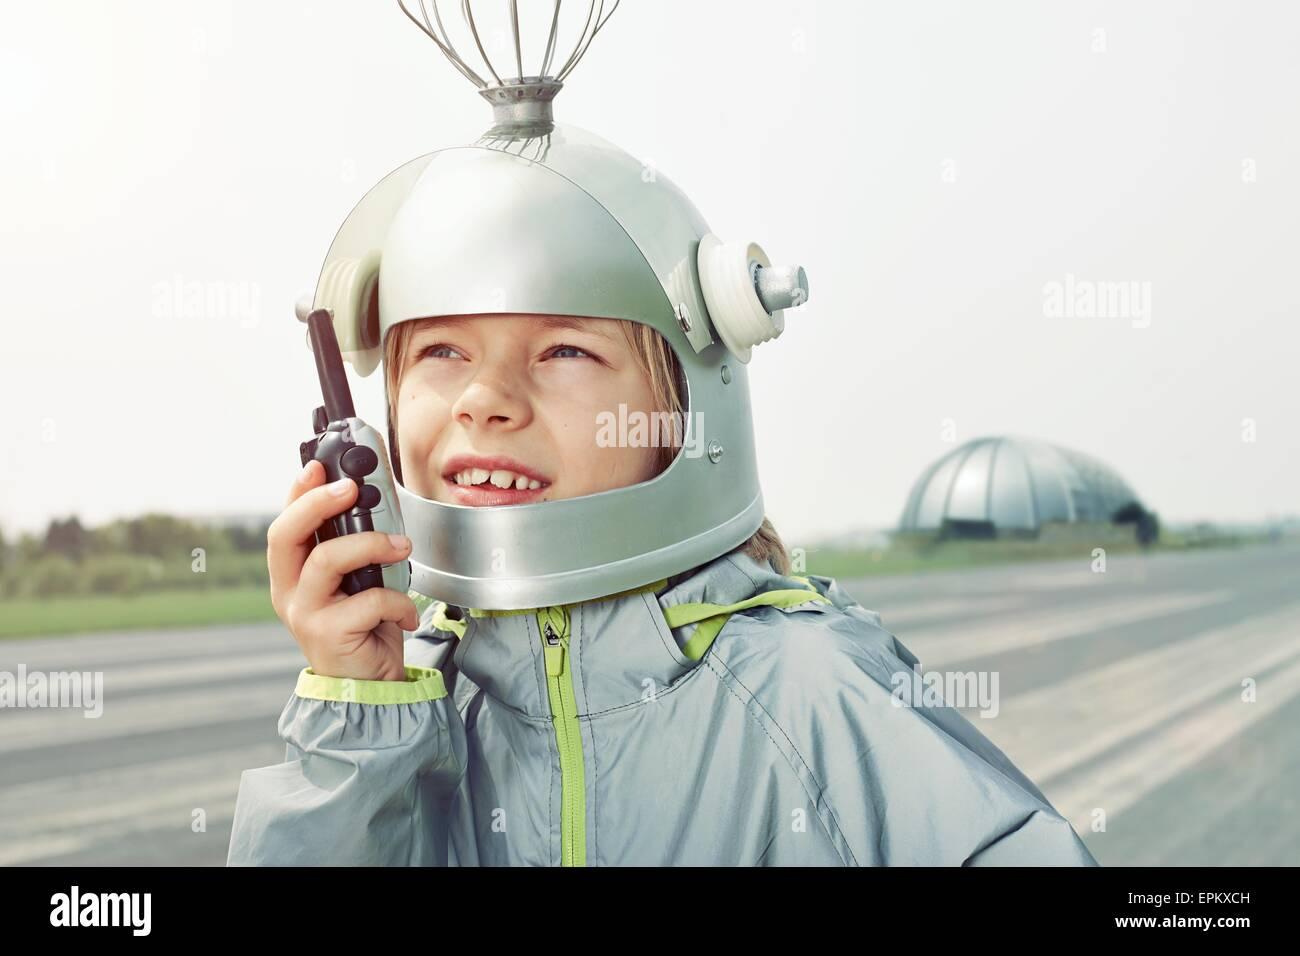 Junge verkleidet als Raumfahrer hält walkie-talkie Stockbild